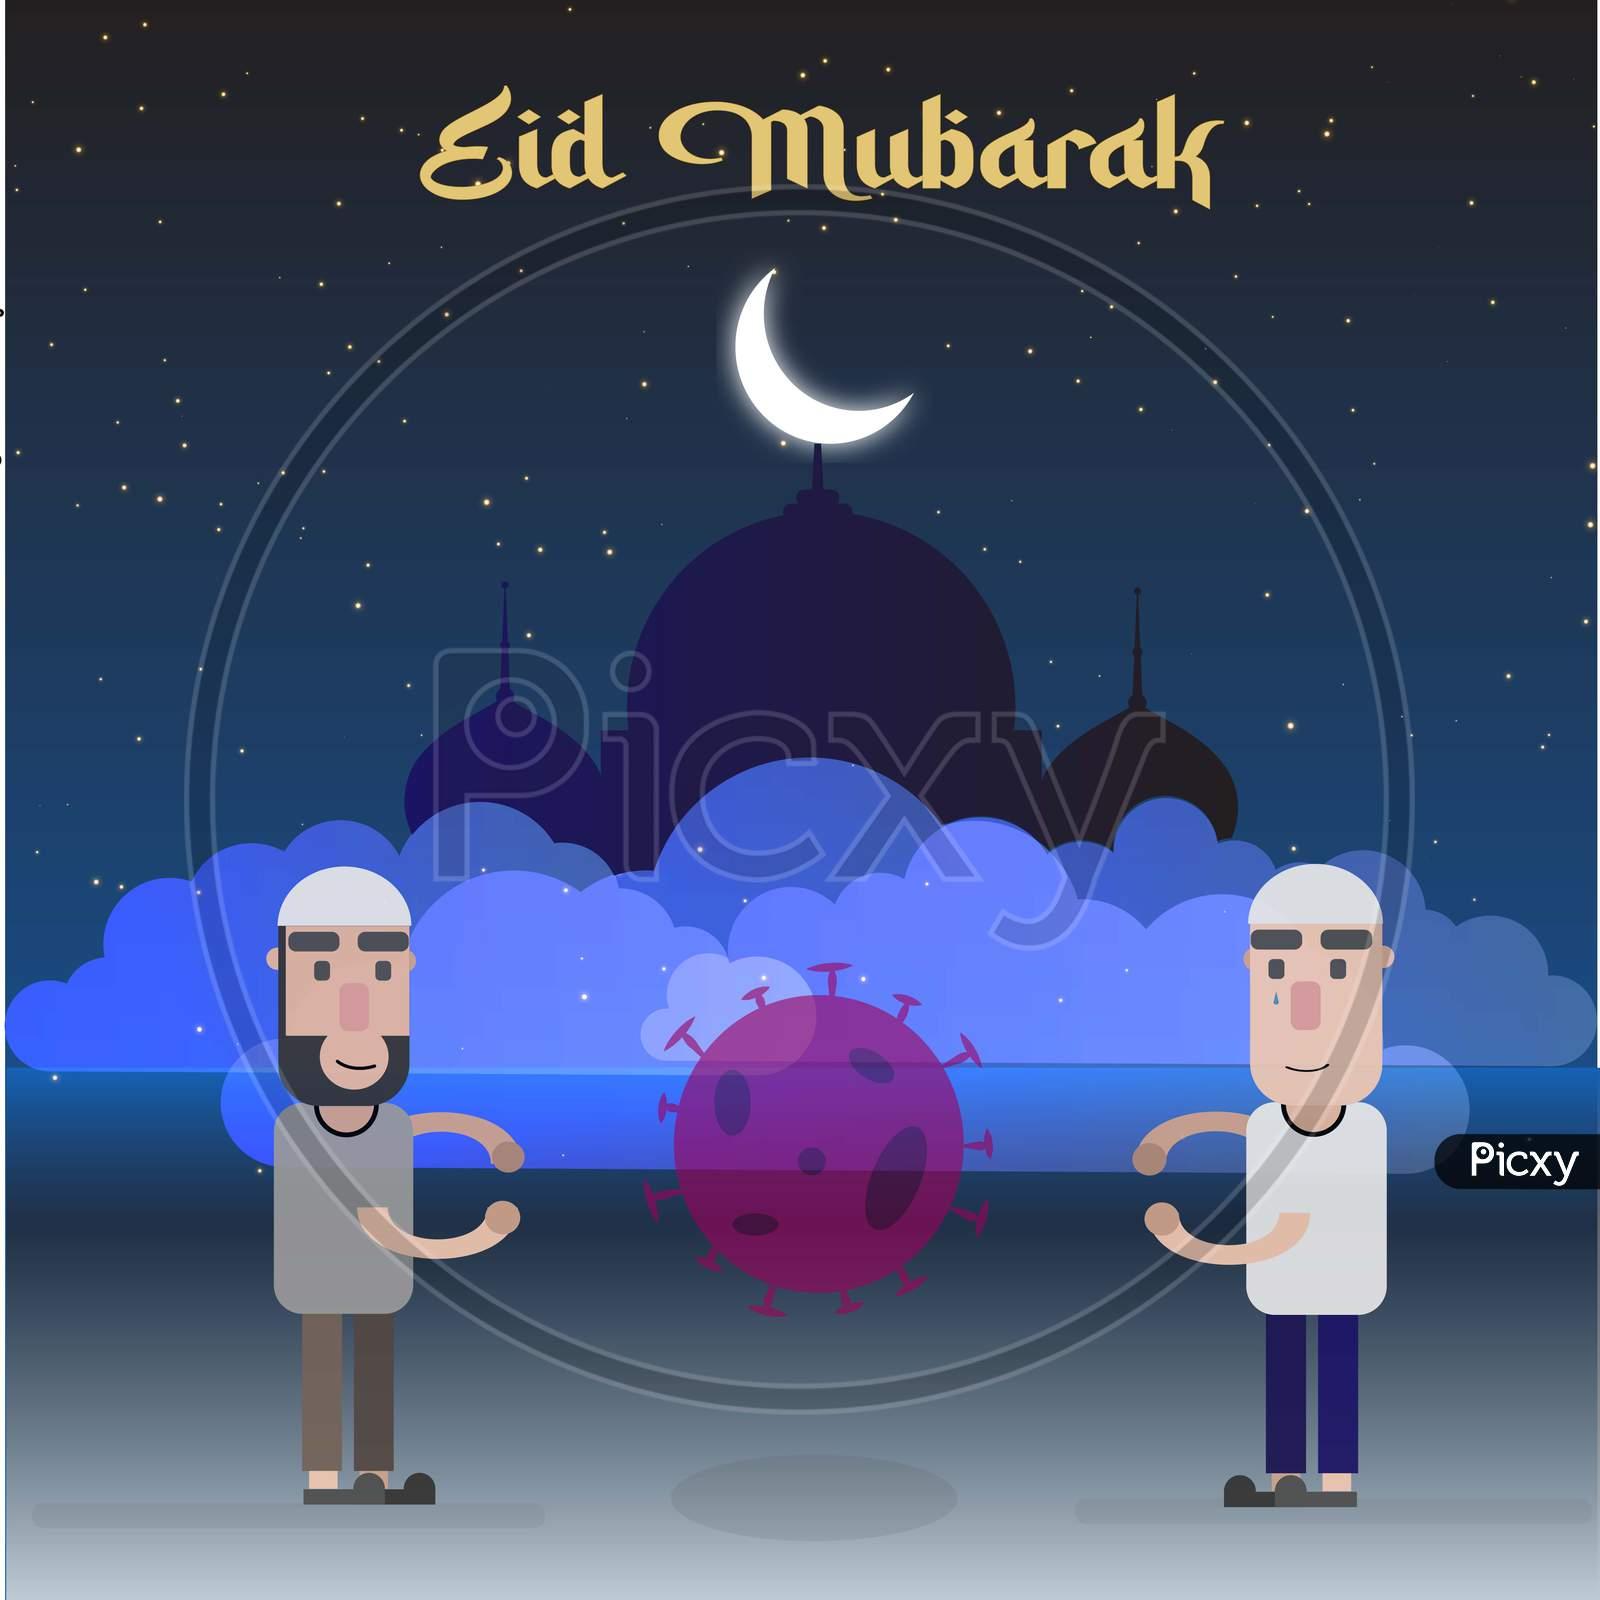 Eid Mubarak Illustration During Coronavirus Pandemic Poster Vector